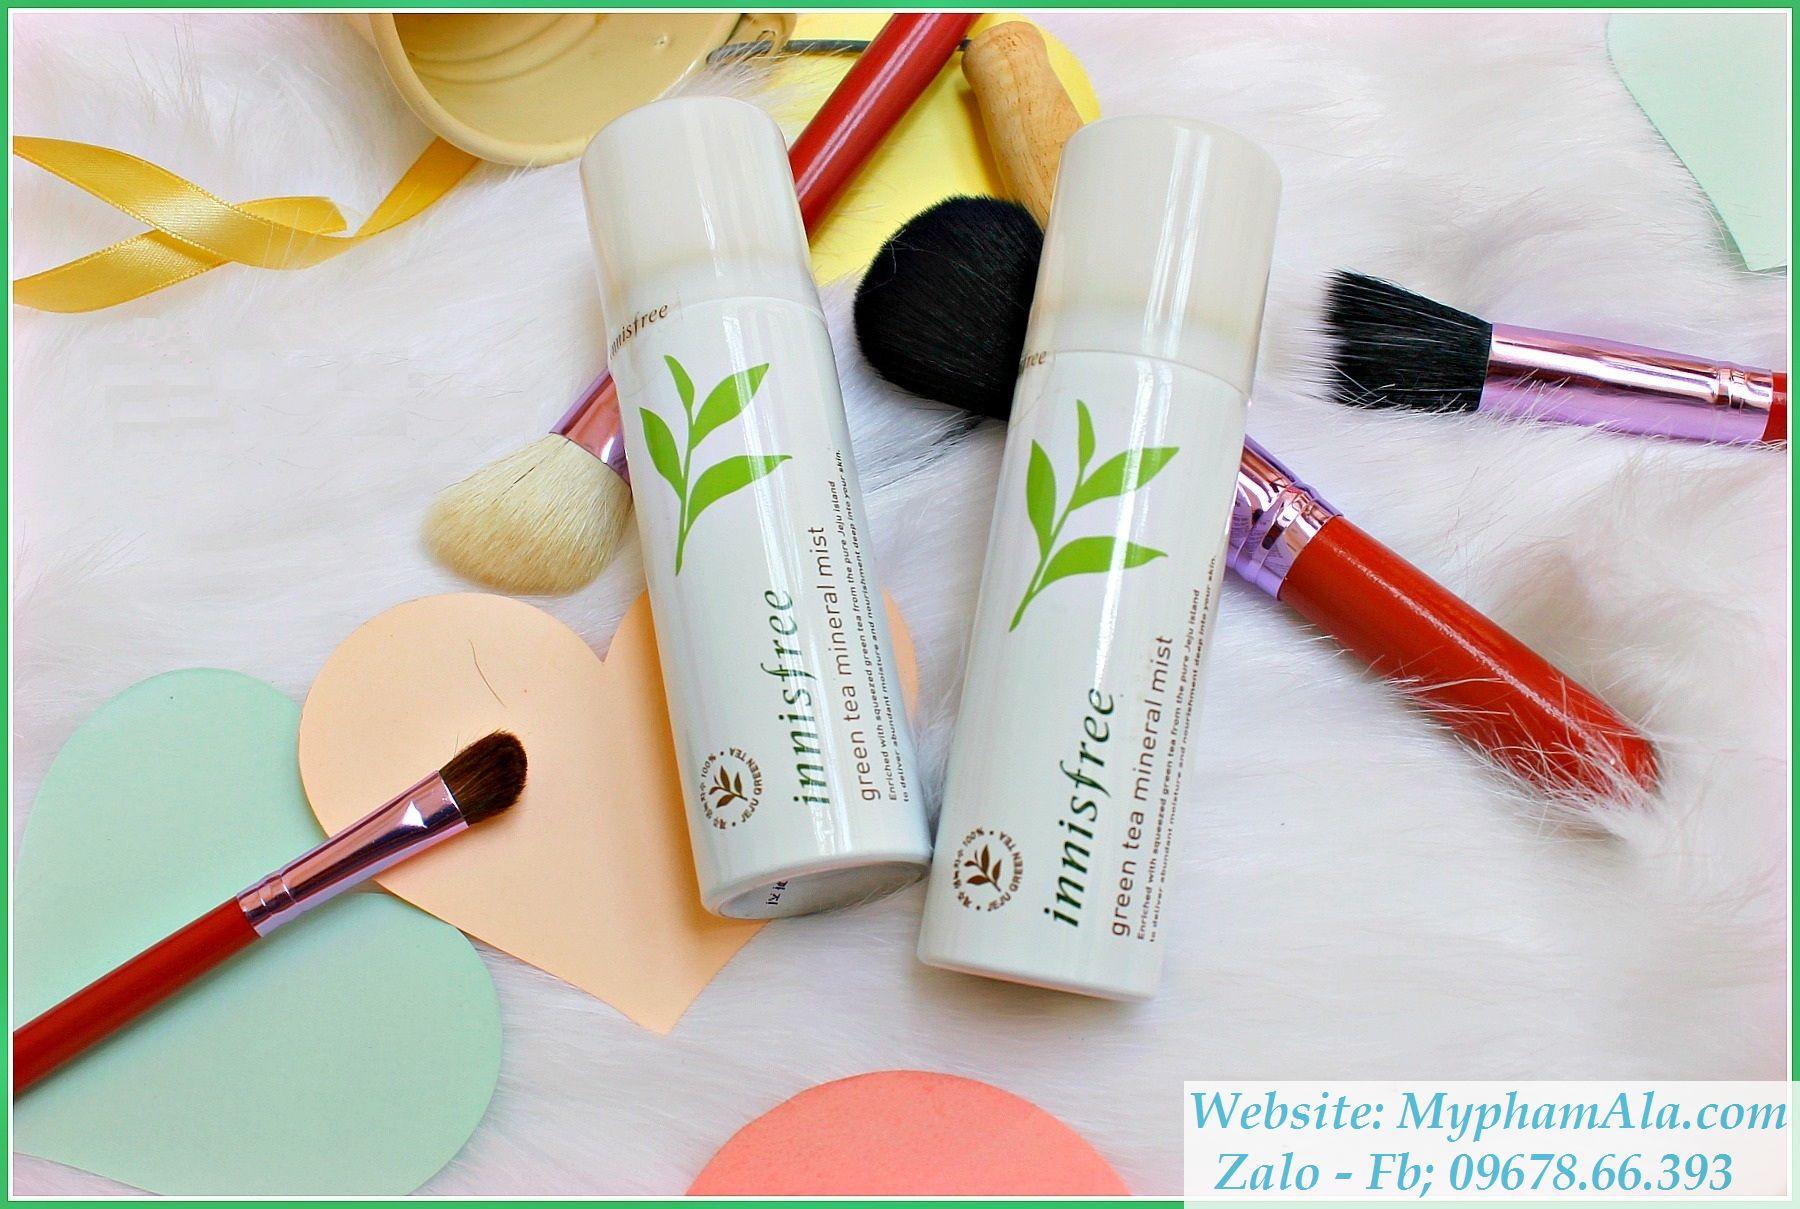 innisfree-green-tea-mineral-mist1497928528 (1)_result